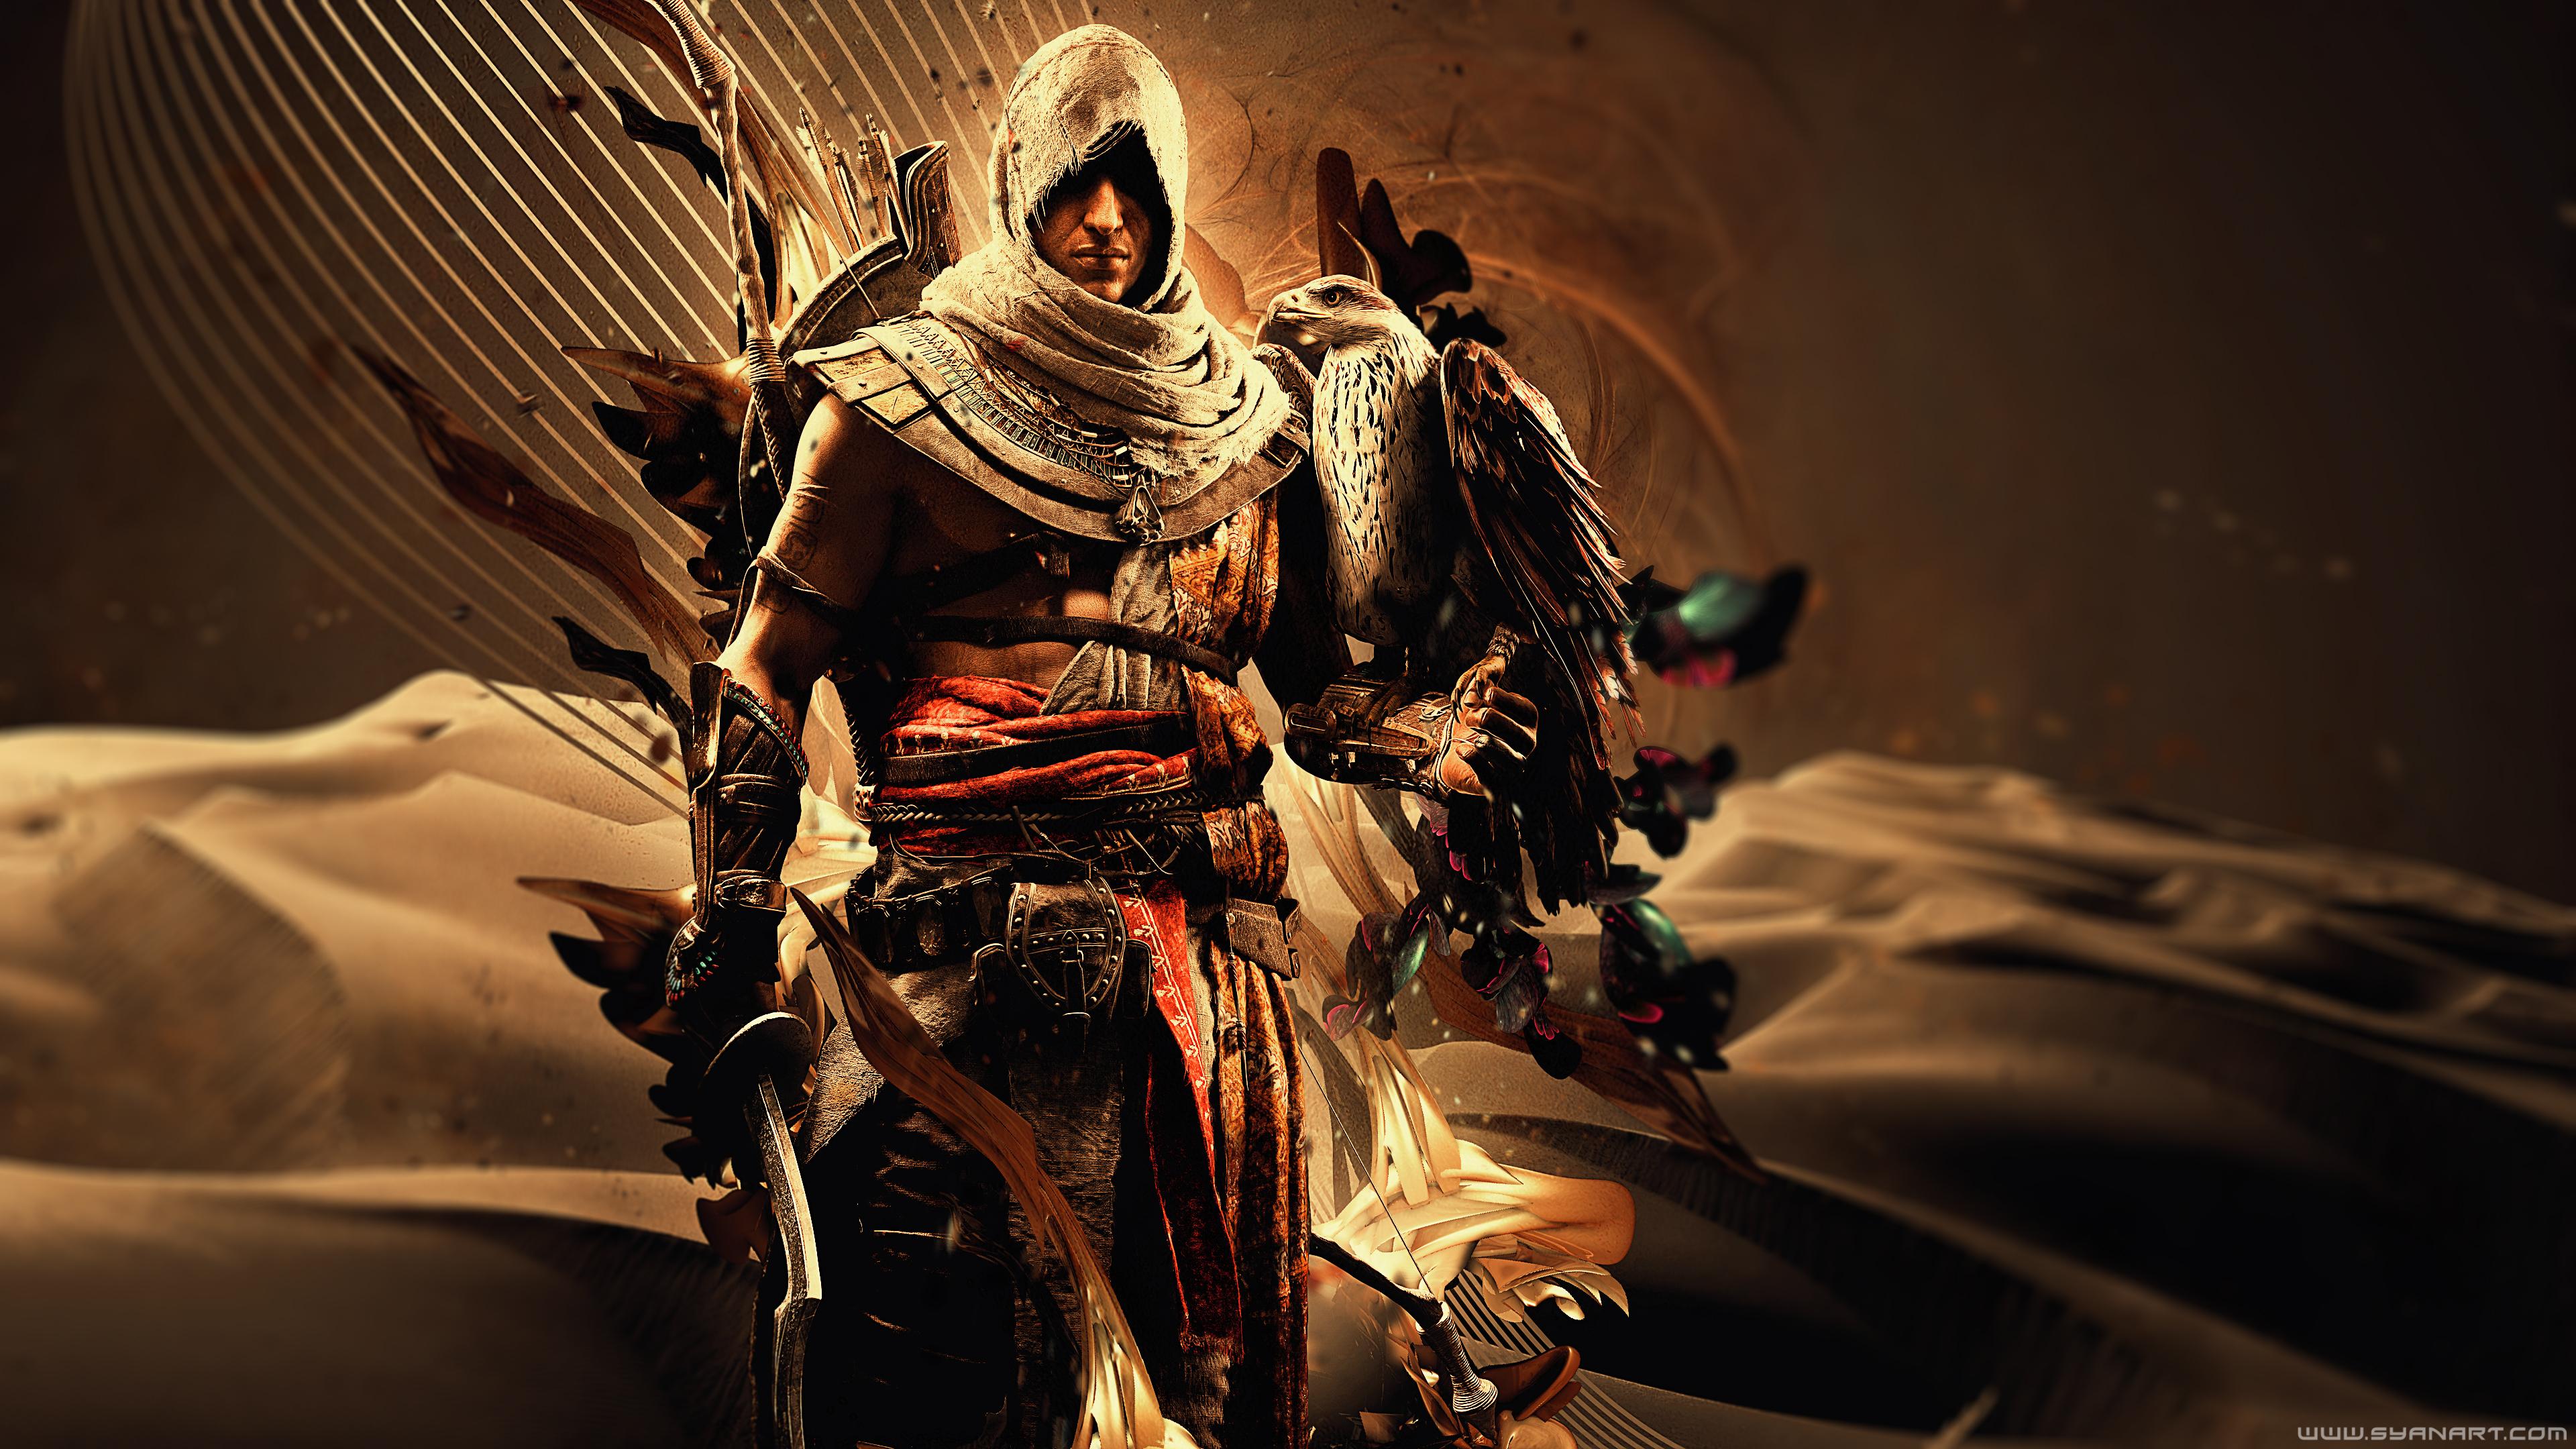 2560x1440 Bayek Of Siwa Assassins Creed Origins 4k 1440P